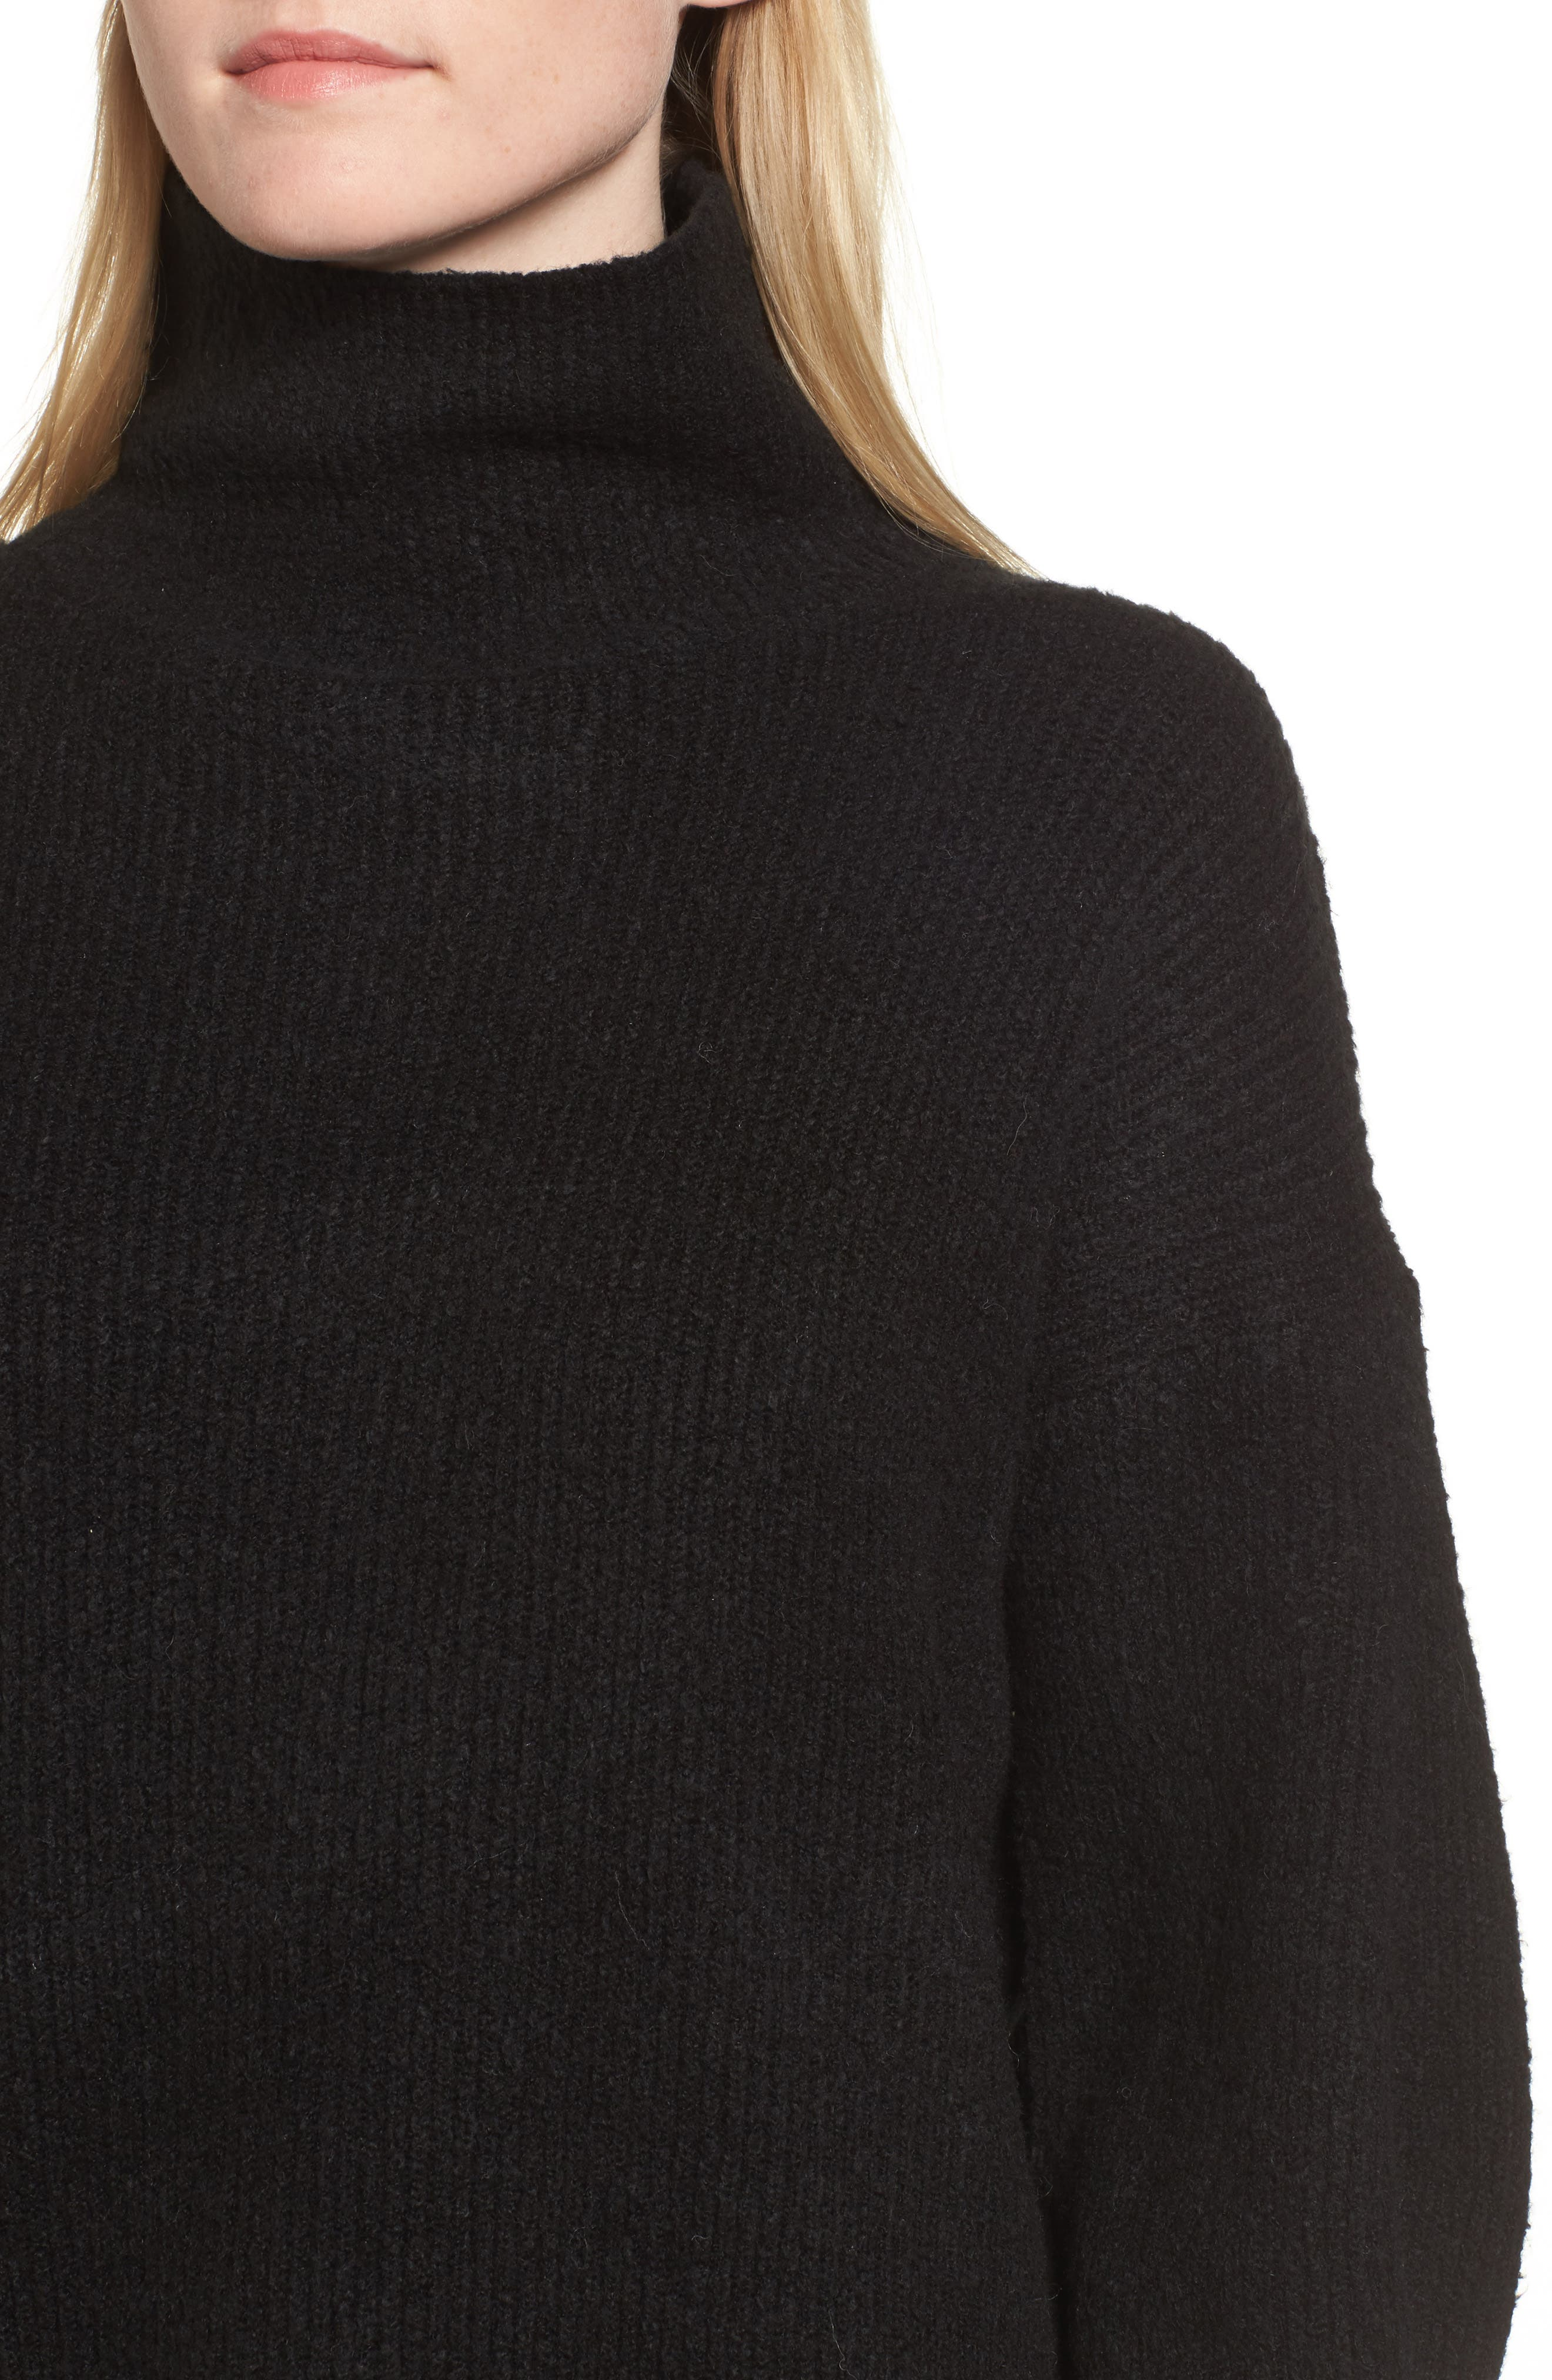 Urban Flossy Turtleneck Sweater,                             Alternate thumbnail 4, color,                             001